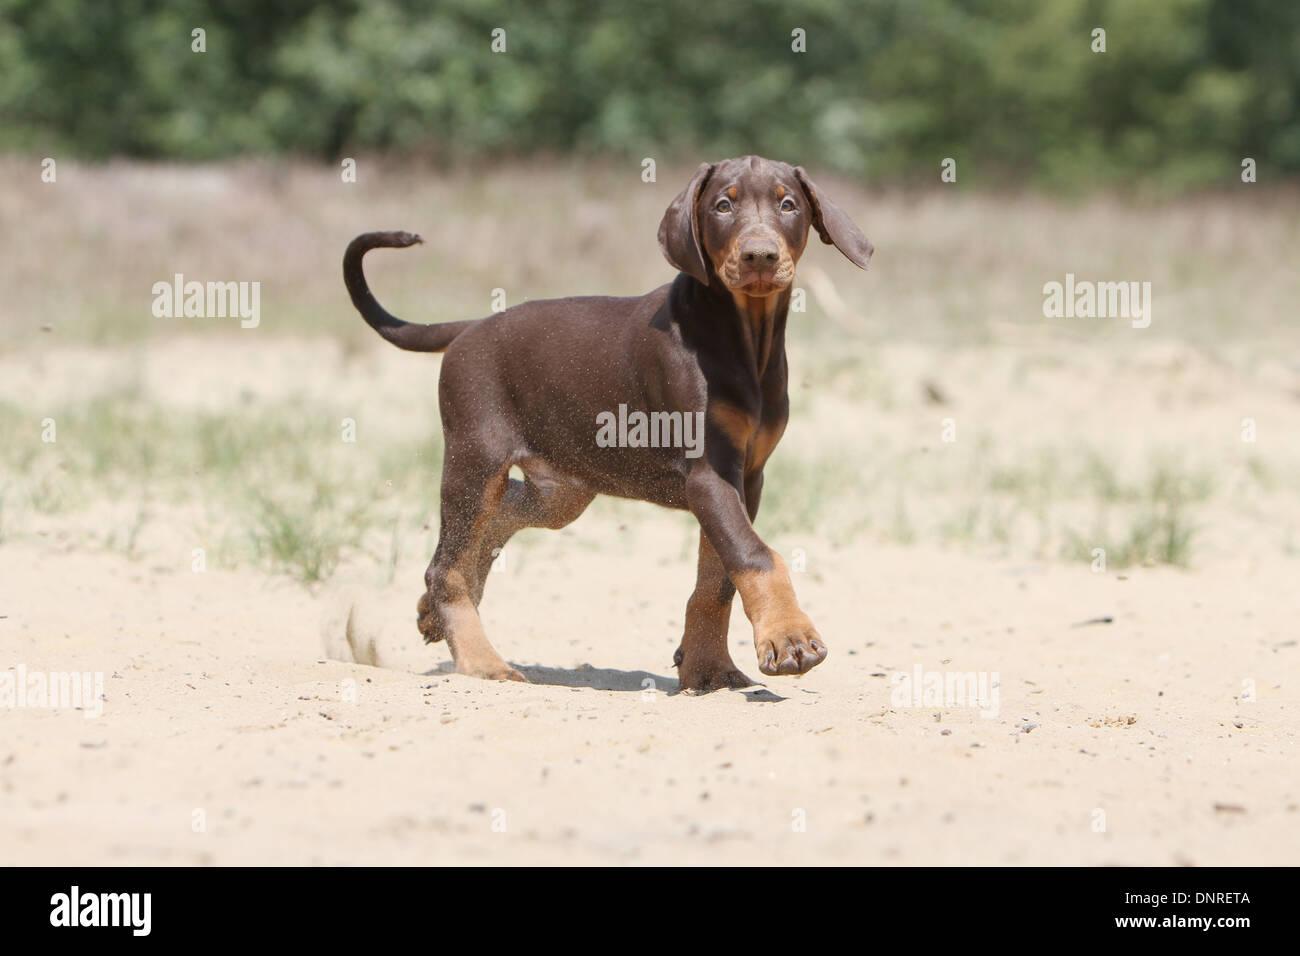 Dog Dobermann / Doberman Pinscher (natural ears) /  puppy walking on the sand - Stock Image